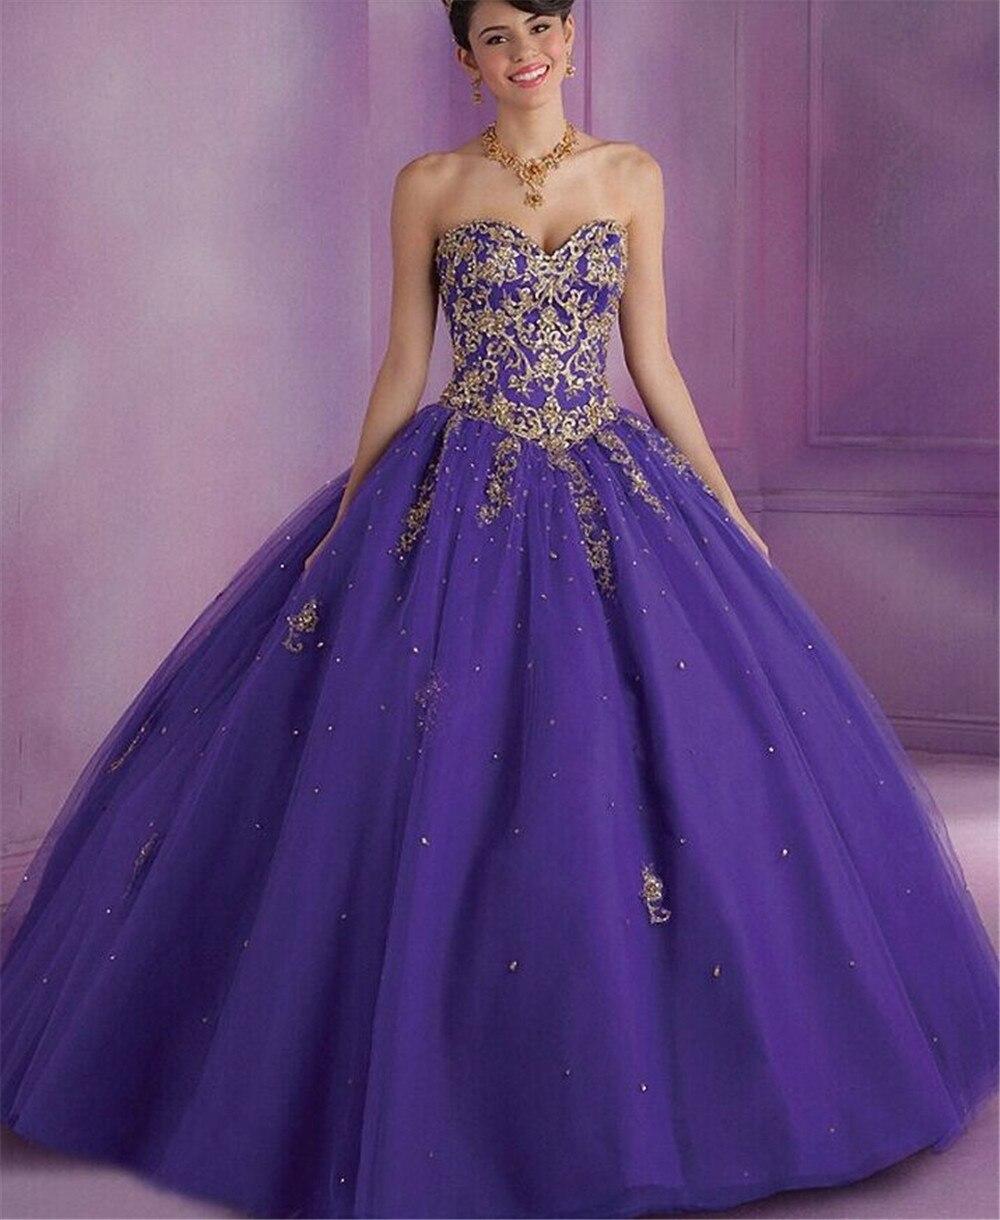 Online Get Cheap Purple Ball Gowns -Aliexpress.com | Alibaba Group